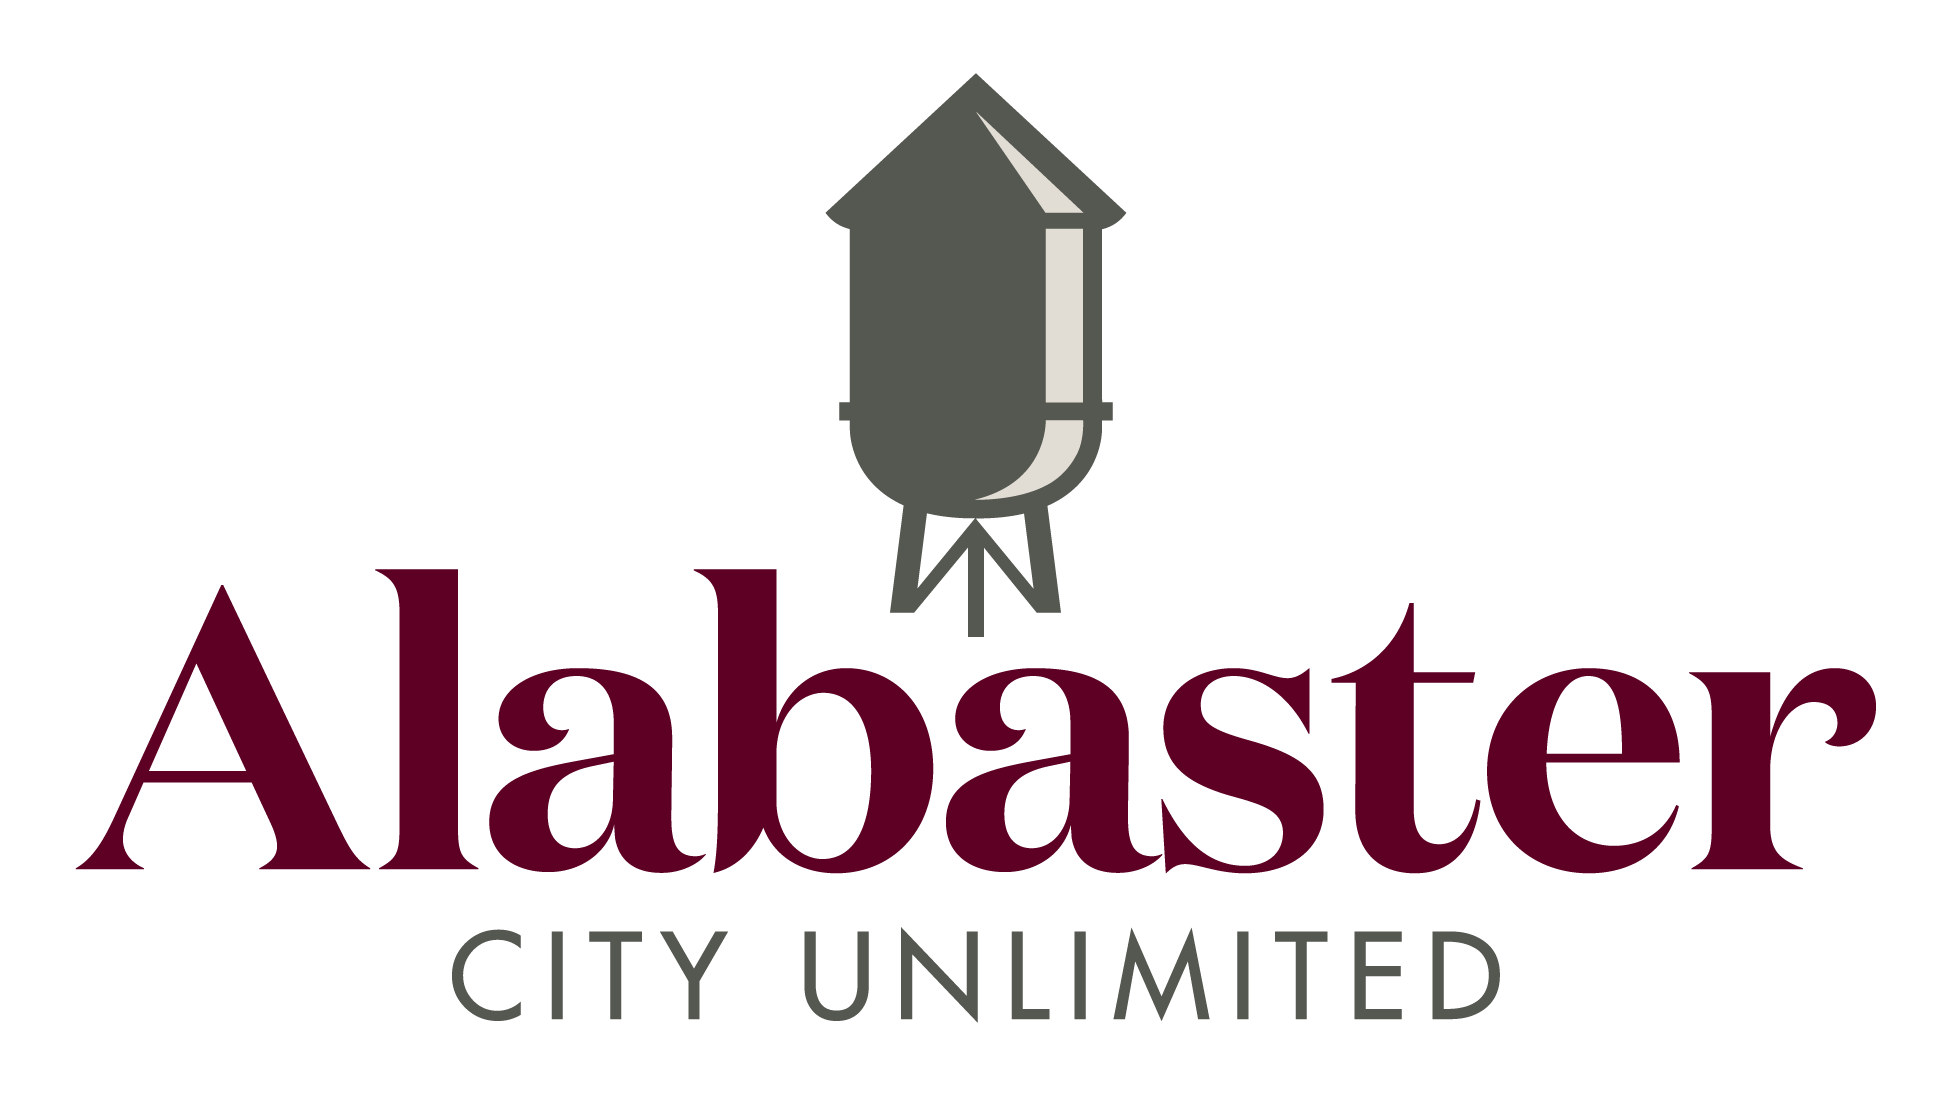 City of Alabaster